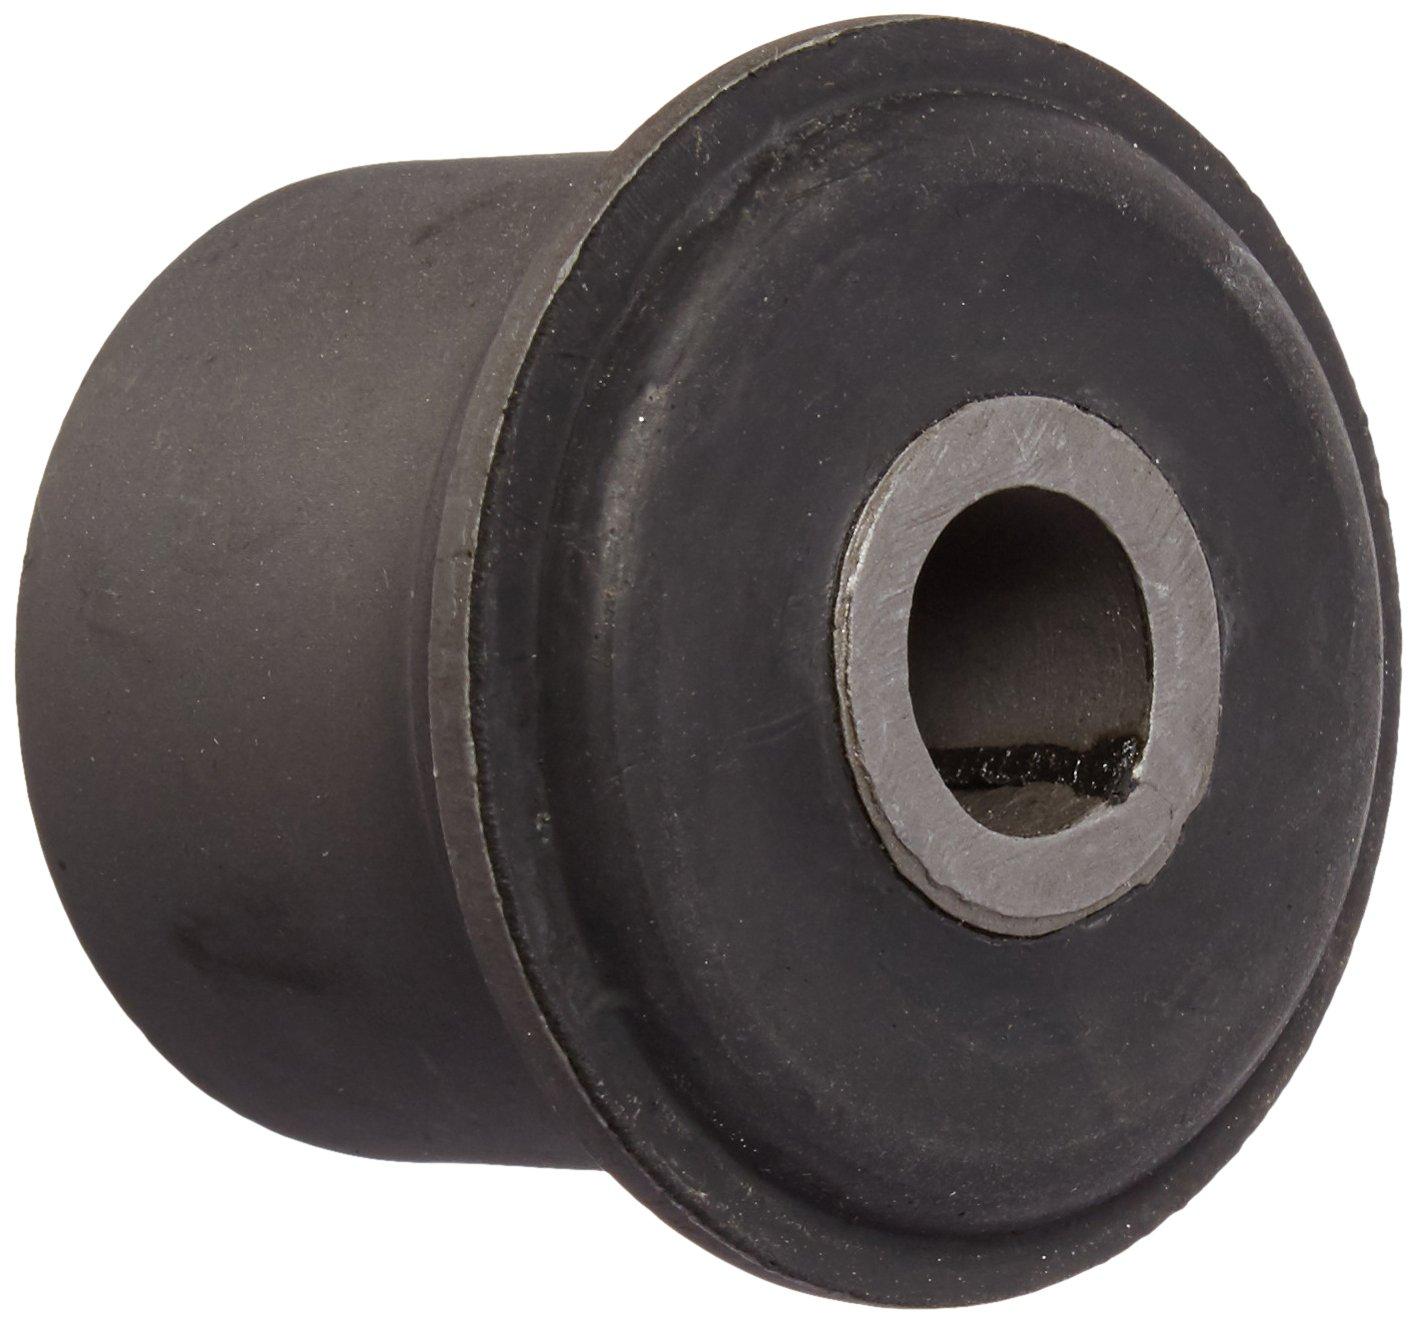 Parts Master K8292 Axle Pivot Bushing PMCK8292